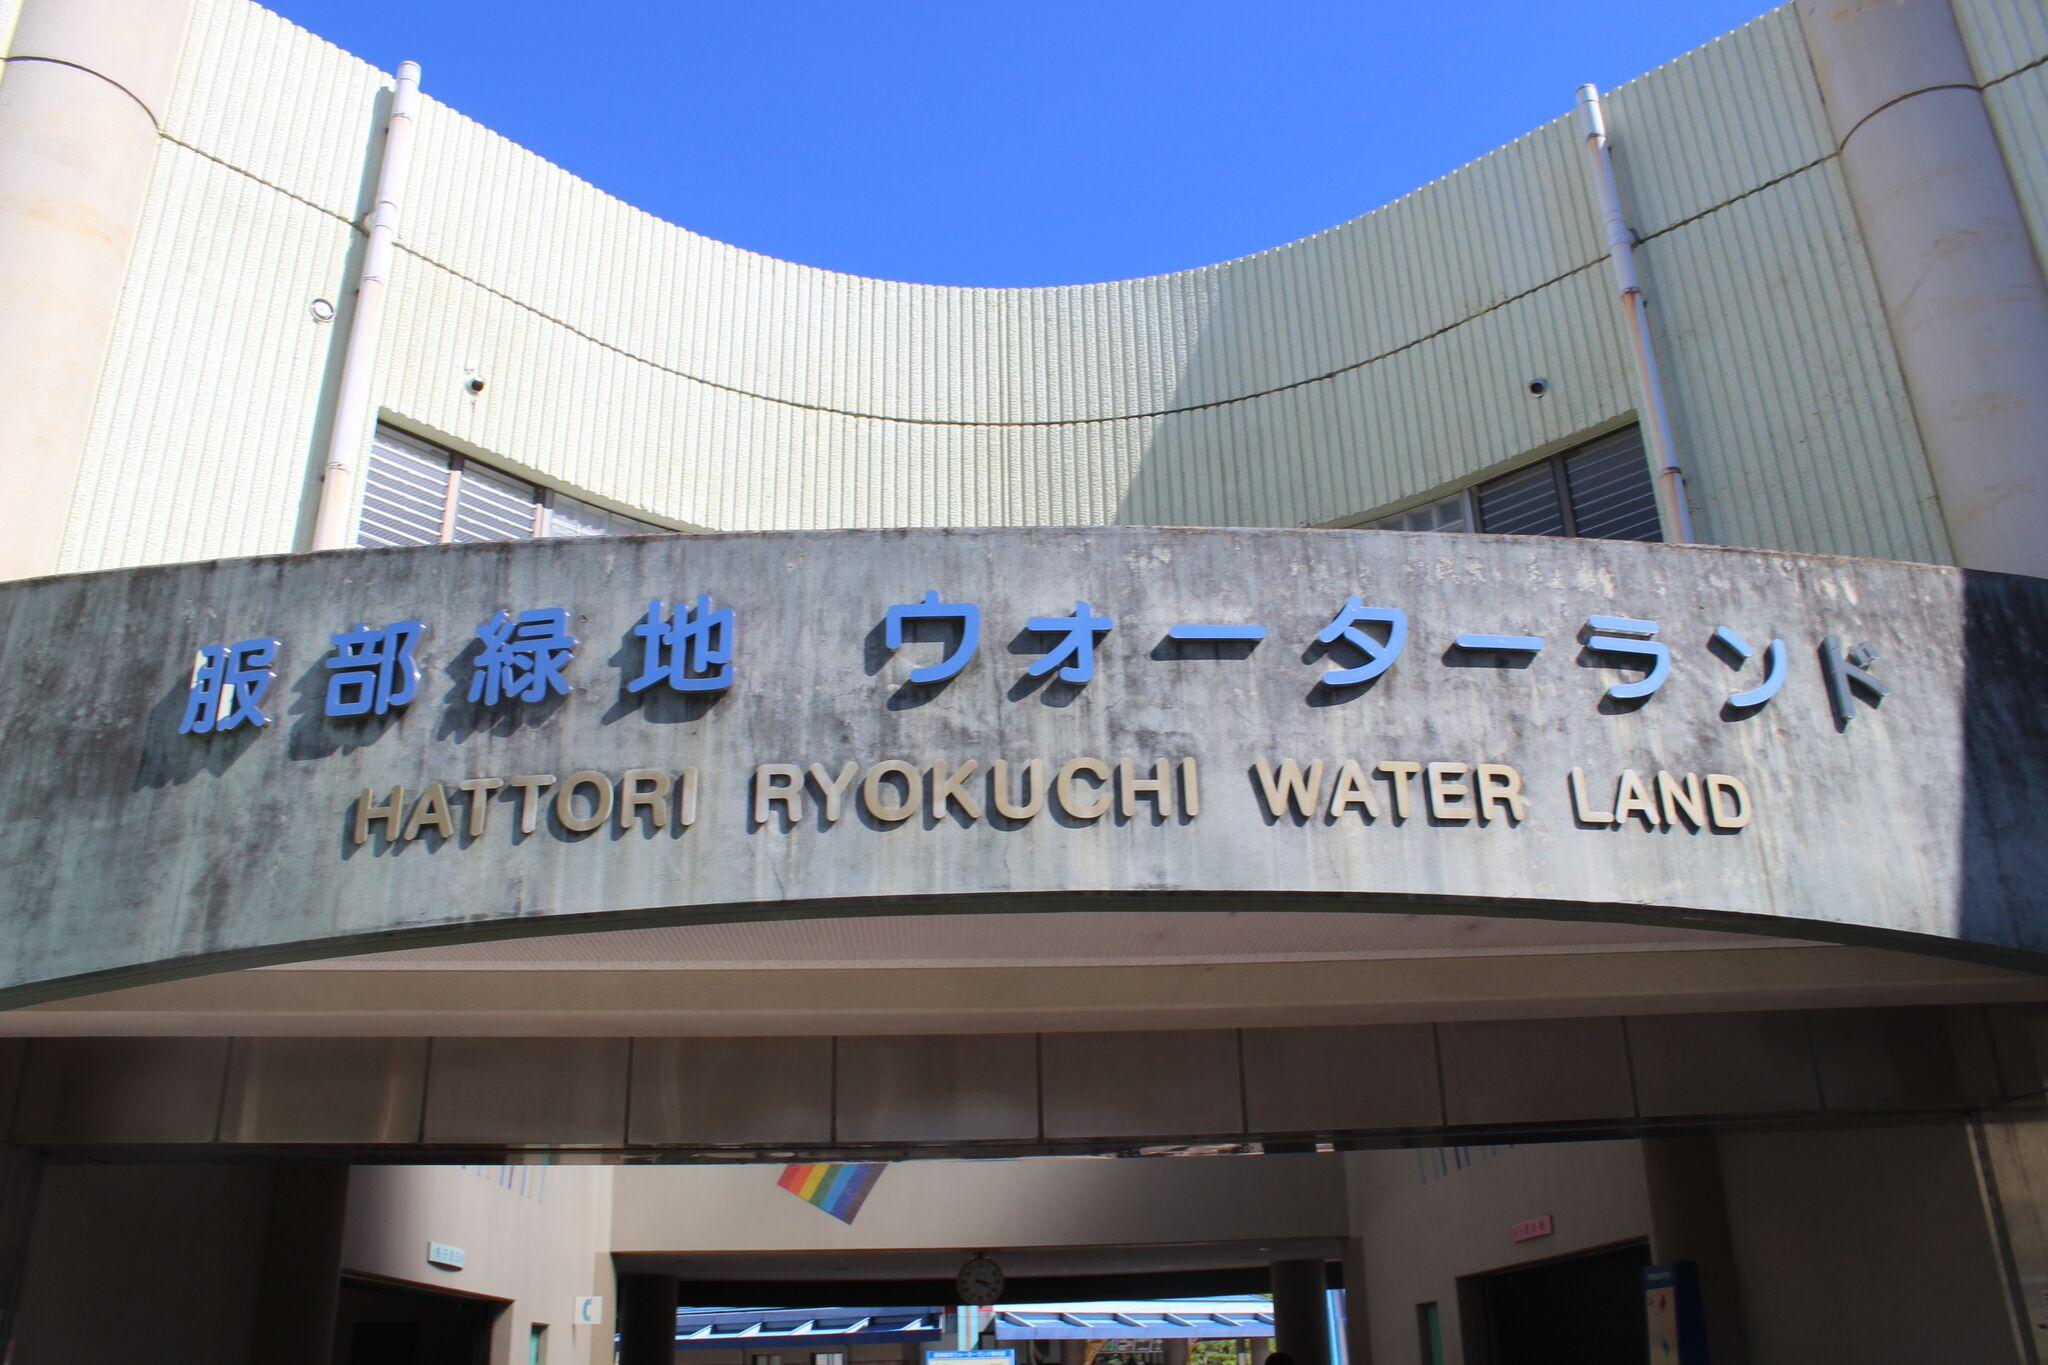 hattoriryokuchi waterland18